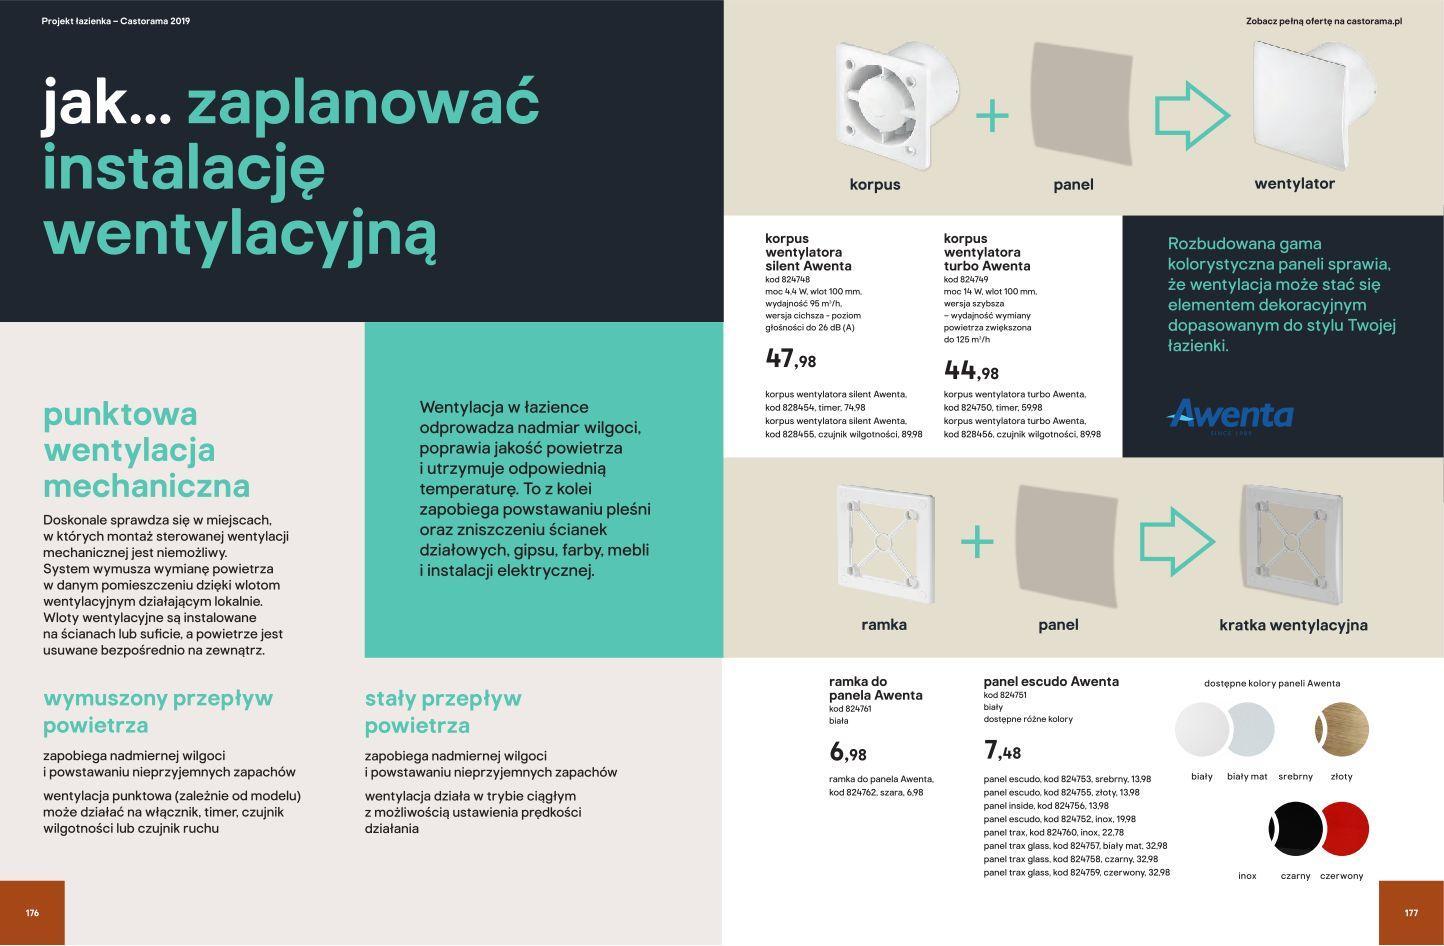 Gazetka promocyjna Castorama do 31/12/2019 str.89